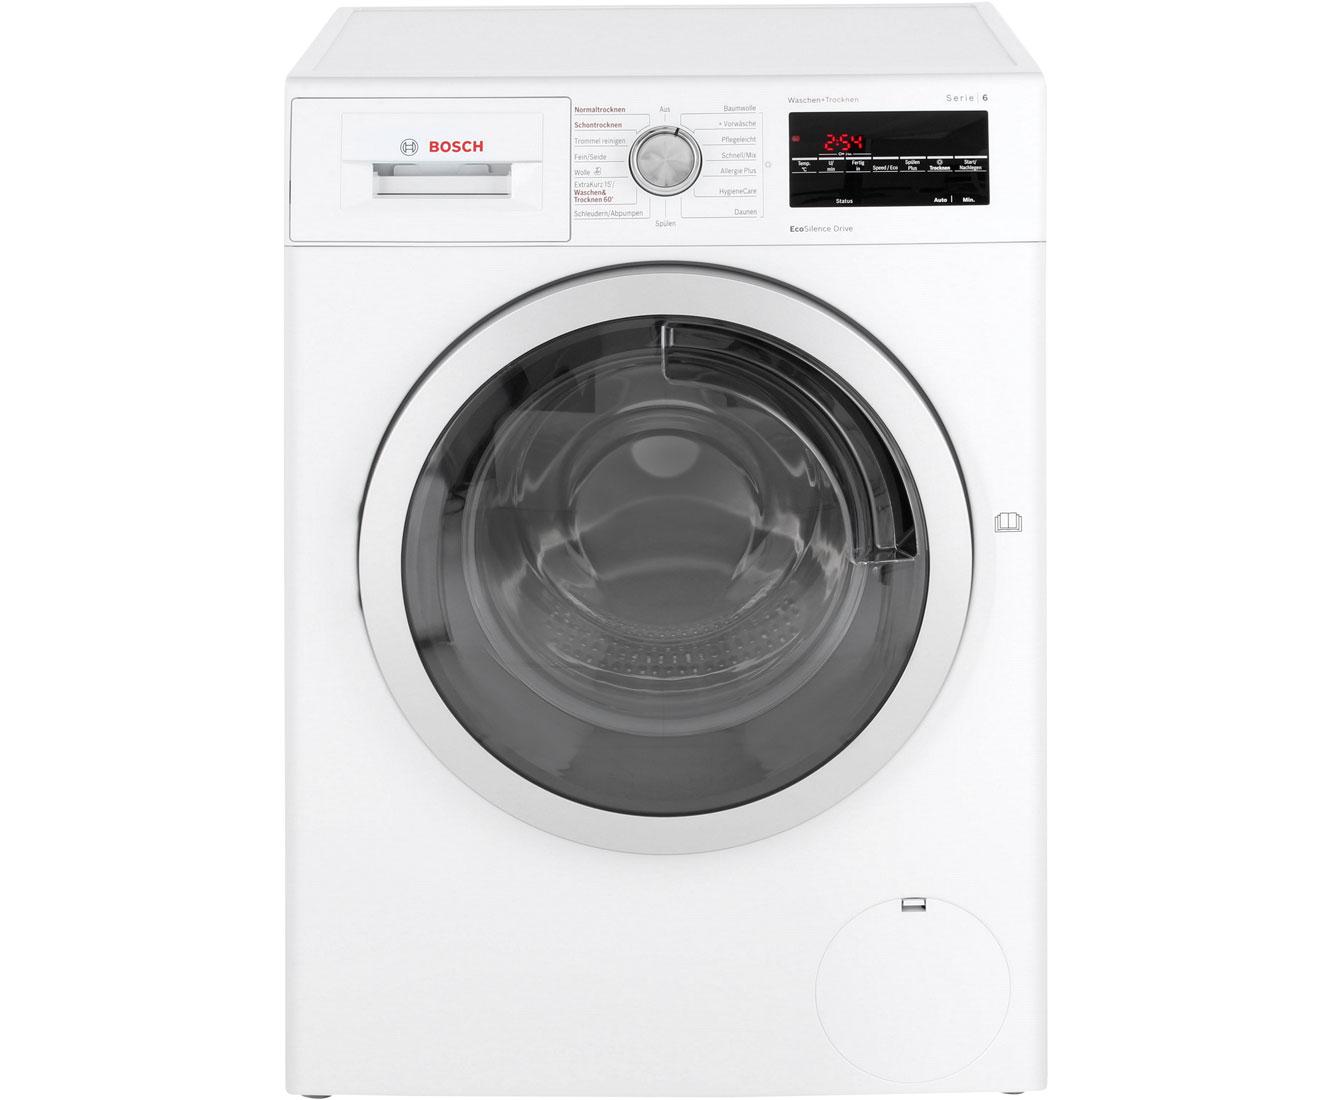 Bosch wvg30443 waschtrockner 7 kg waschen 4 kg trocknen 1500 u min